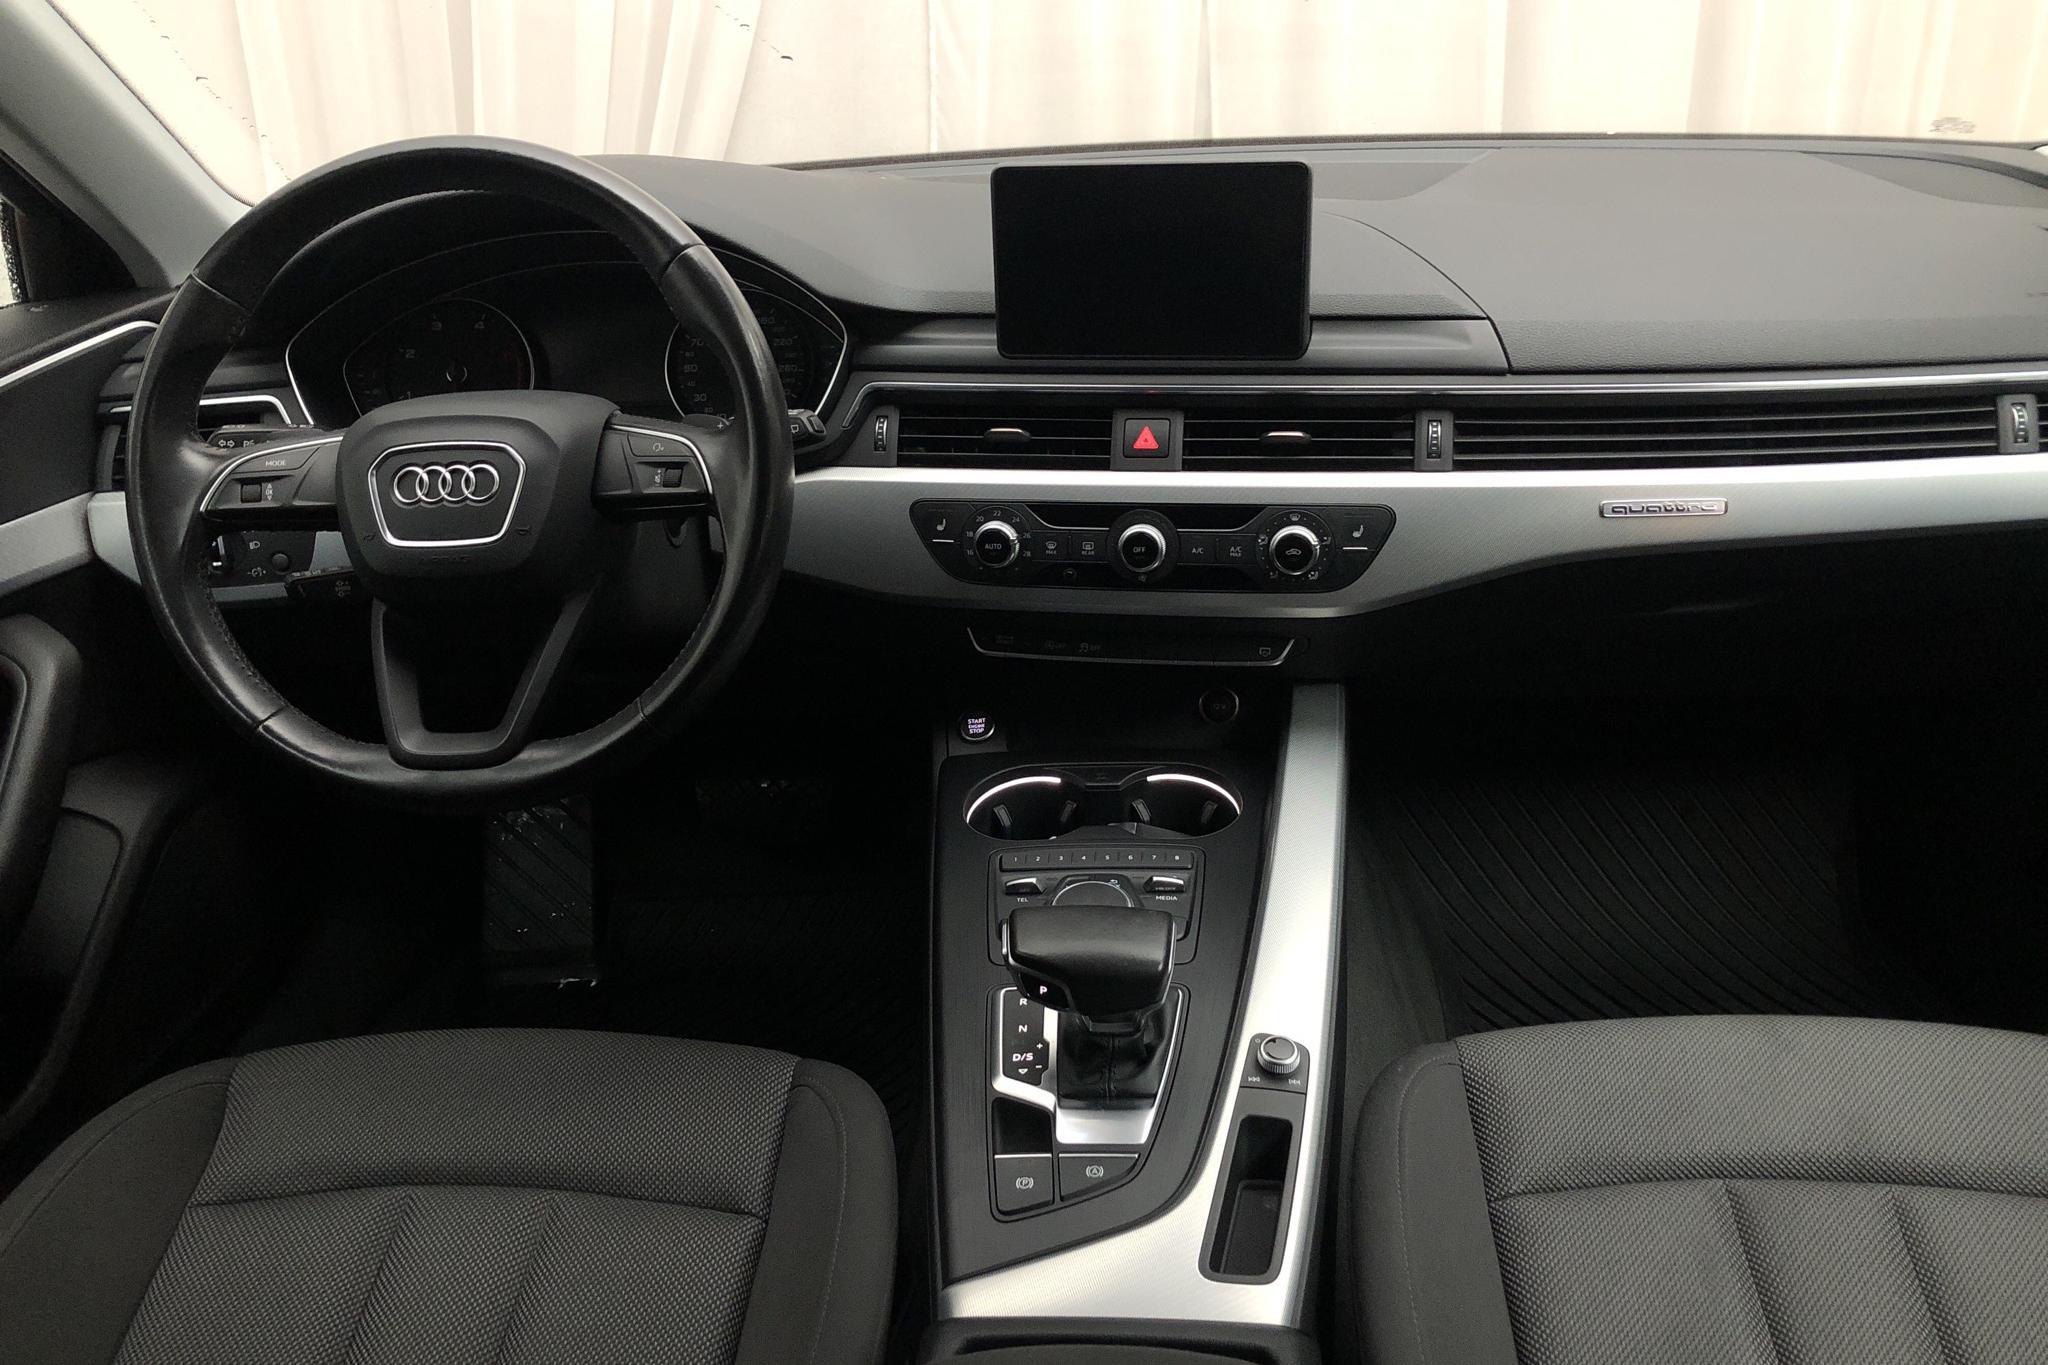 Audi A4 2.0 TDI Avant quattro (190hk) - 71 010 km - Automatic - red - 2016